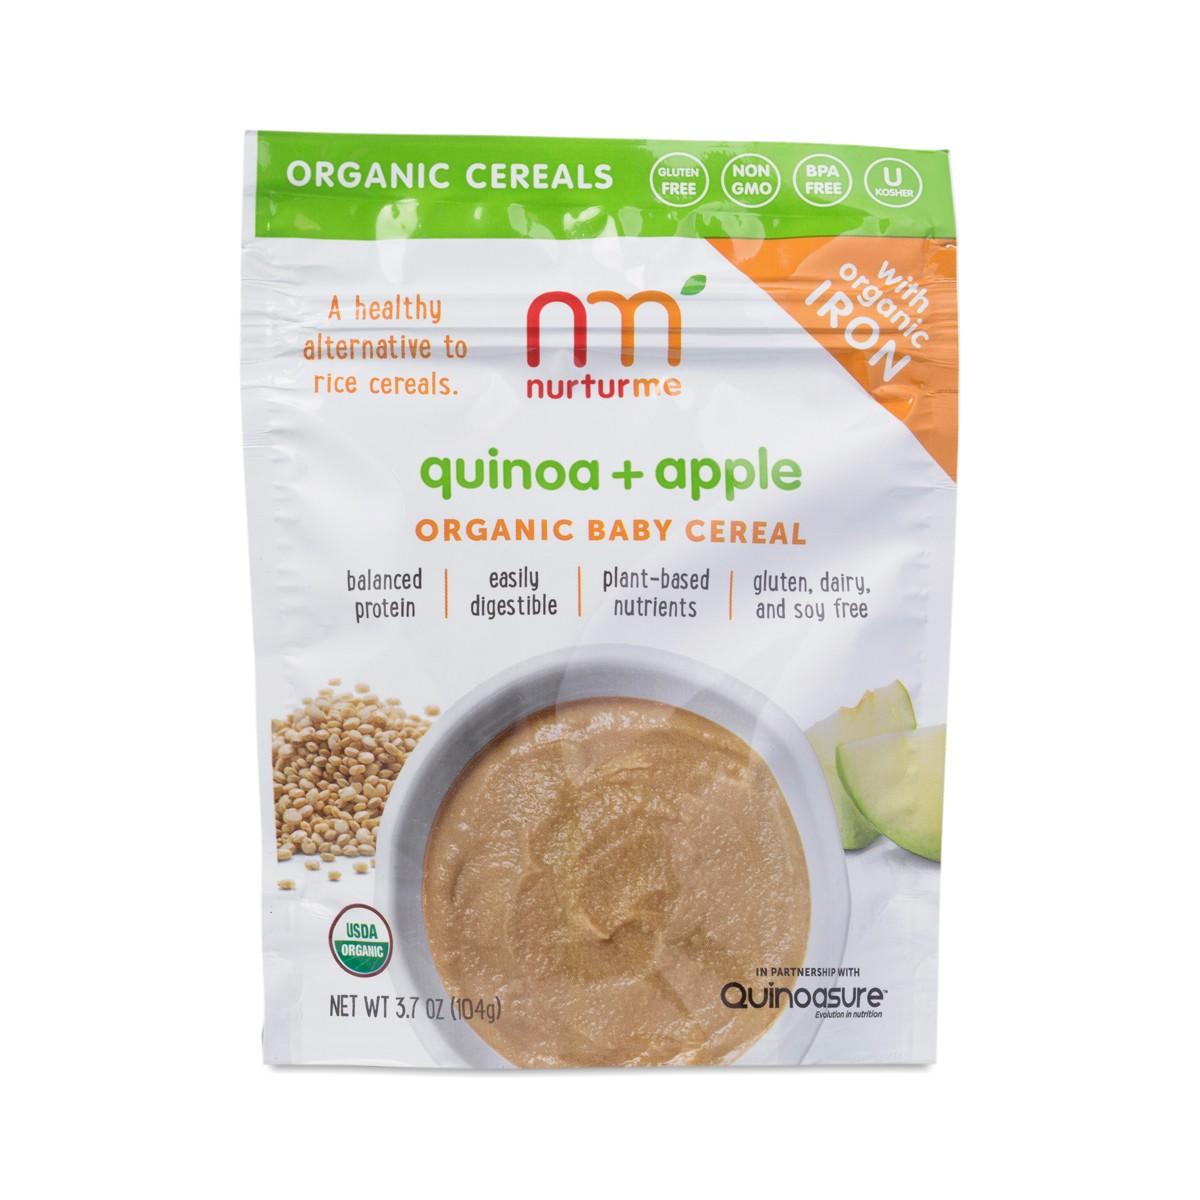 Quinoa+Apple Organic Baby Cereal